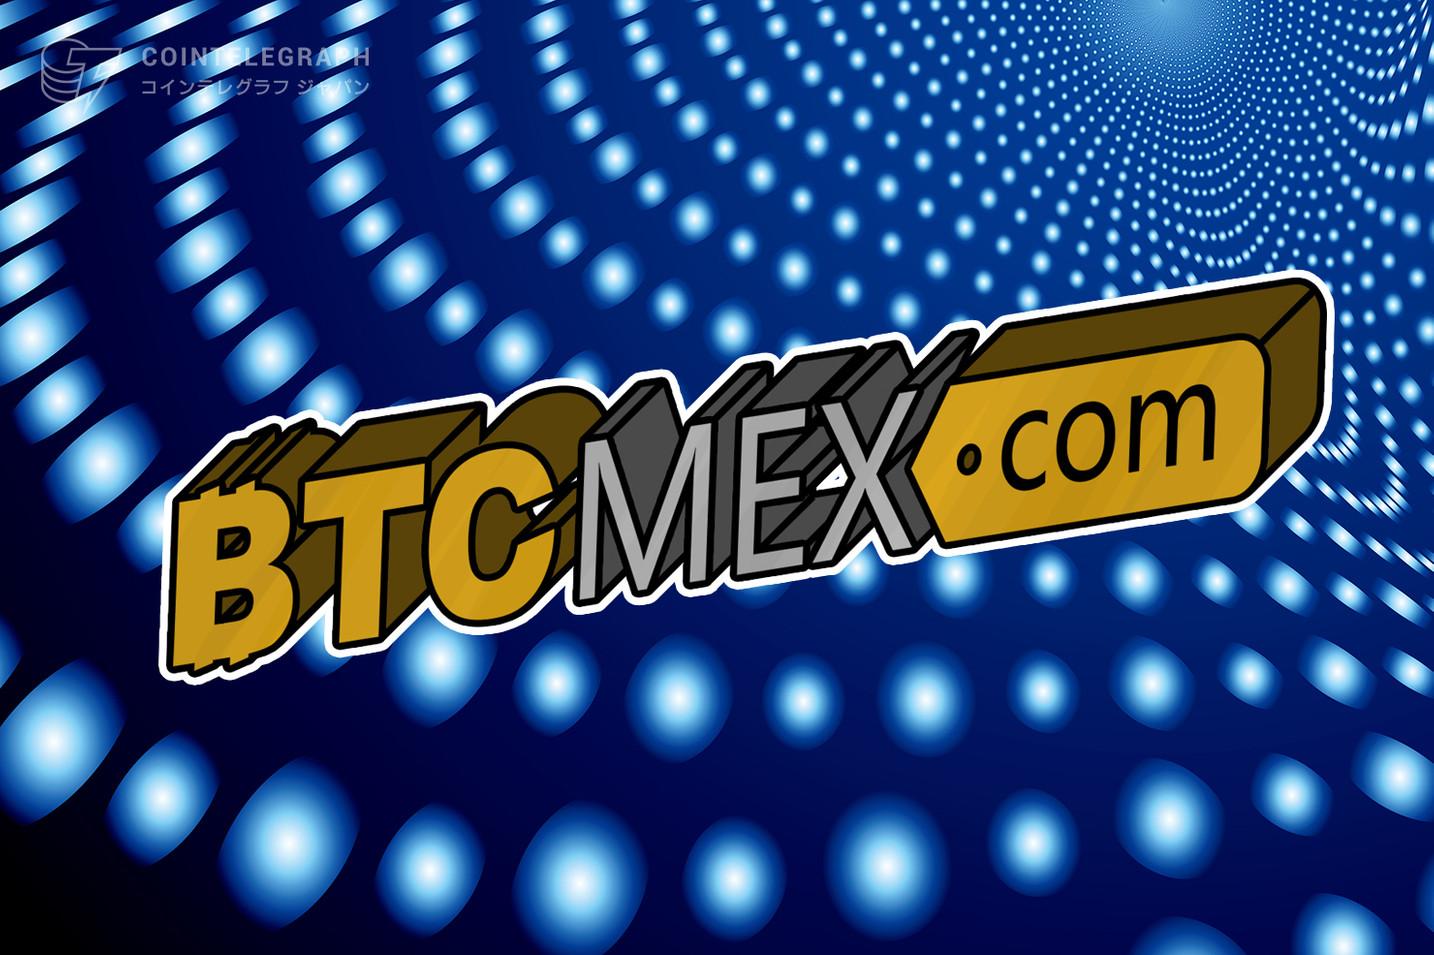 BTCMEX が最大賞金45,000USDのトレードコンペ開催を発表